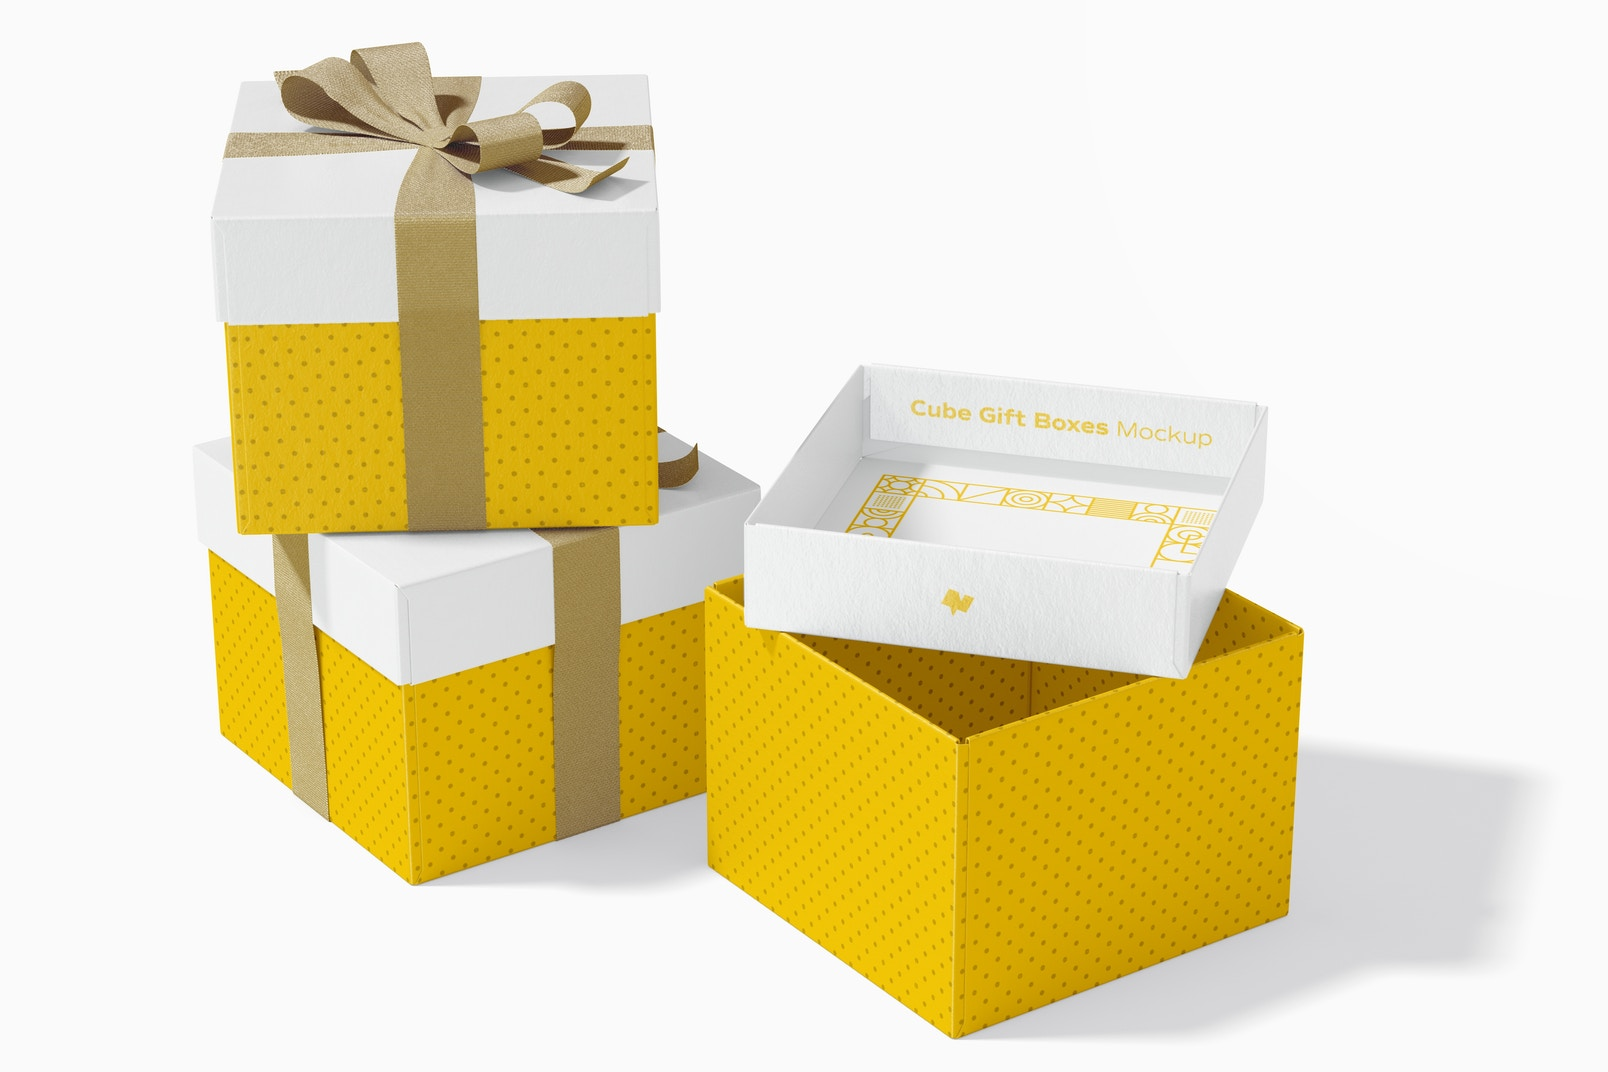 Cube Gift Boxes With Ribbon Set Mockup